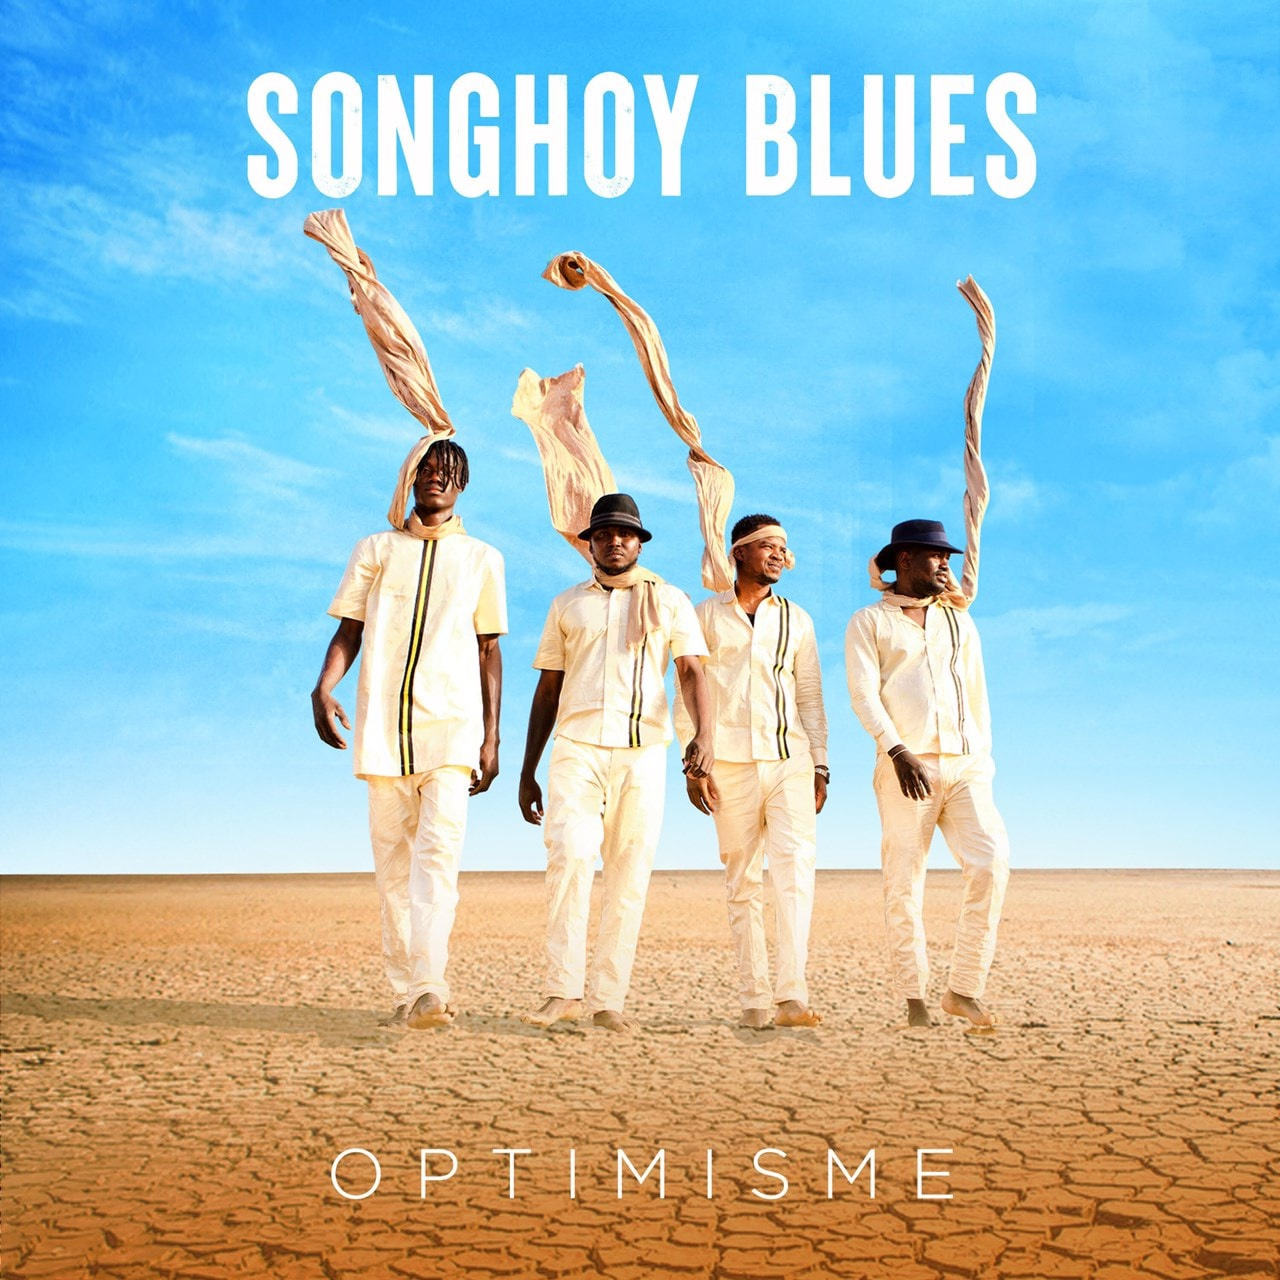 SONGHOY BLUES - OPTIMISE (GOLD VINYL)